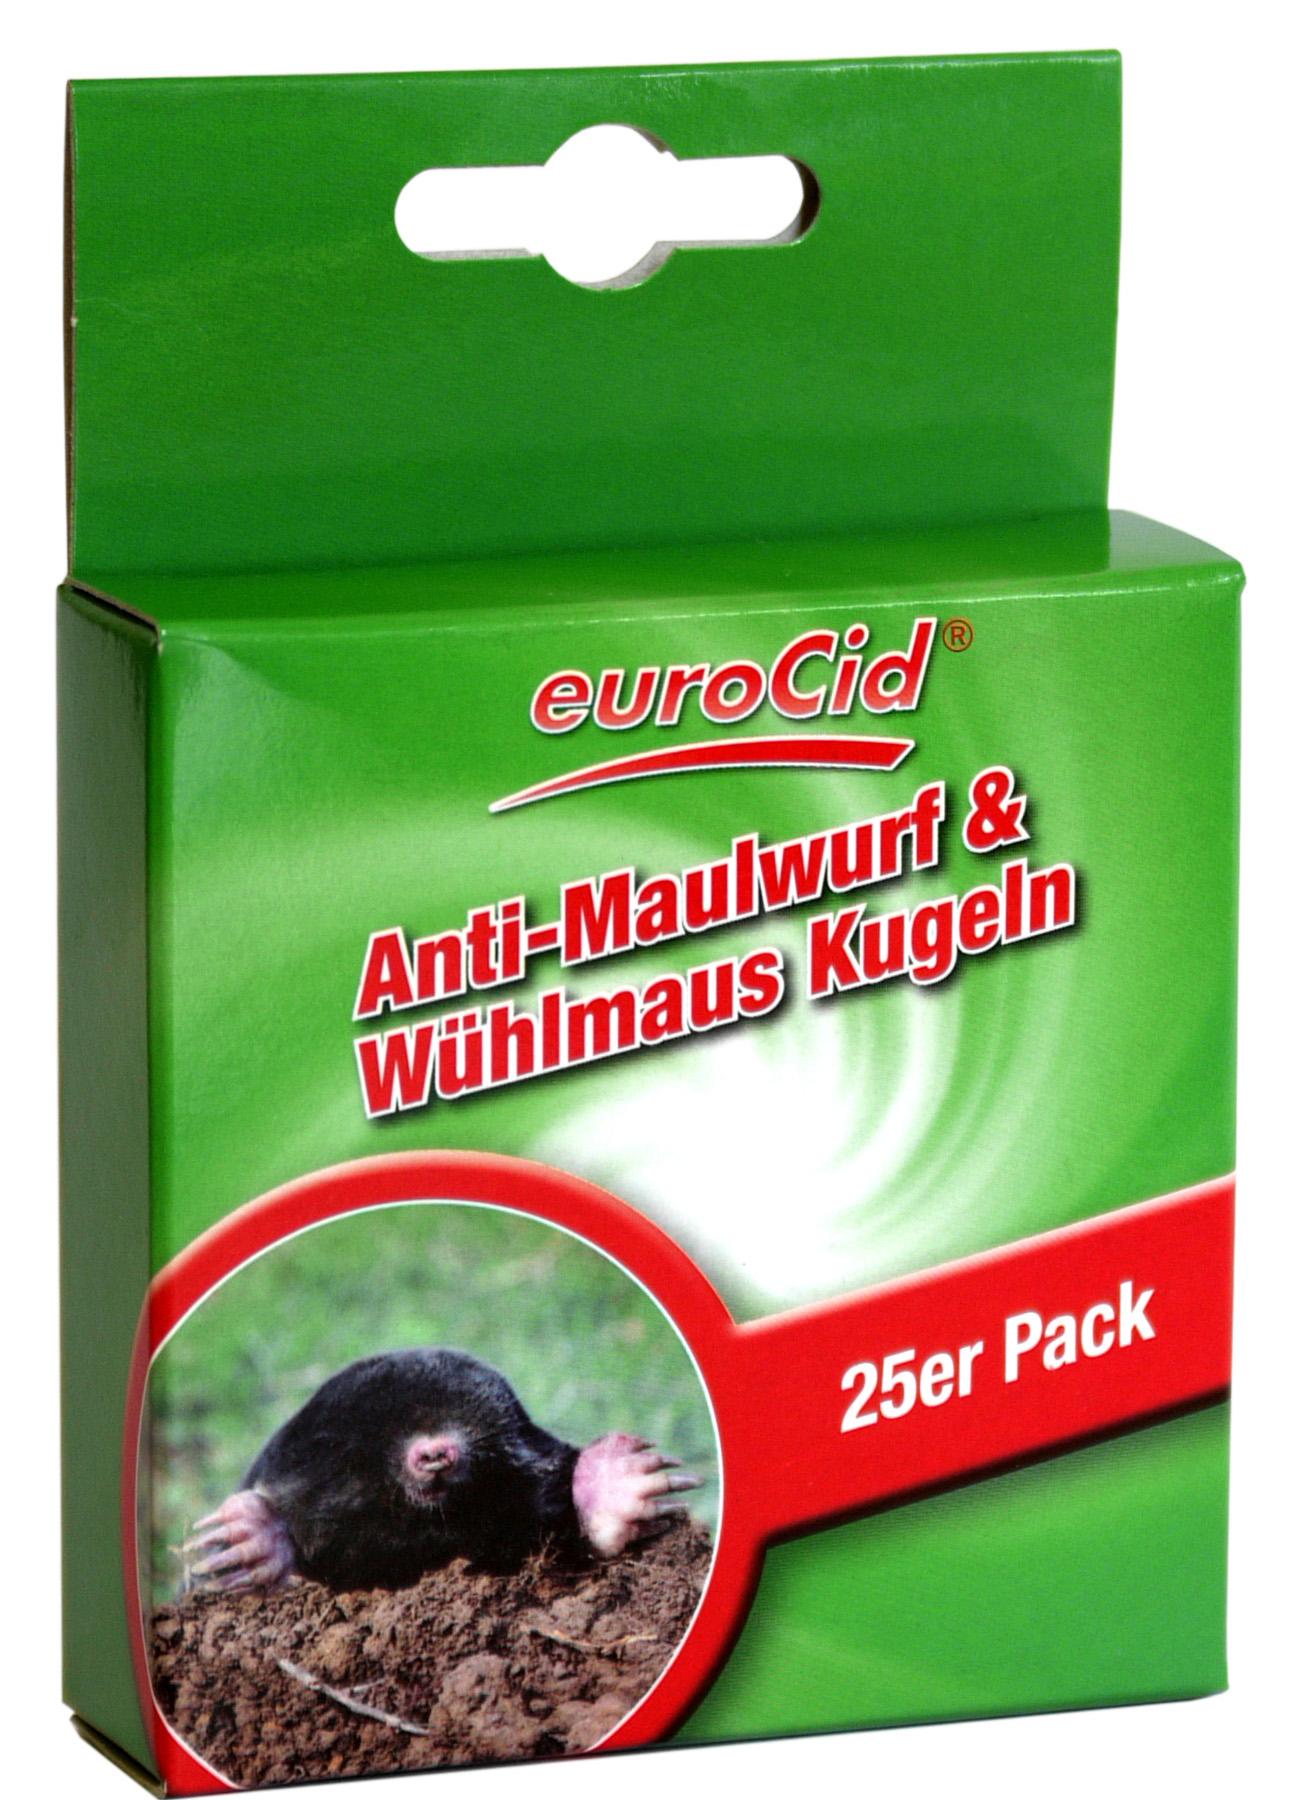 02187 - euroCid Anti-Maulwurf & Wühlmaus Kugeln 25er BIOZID